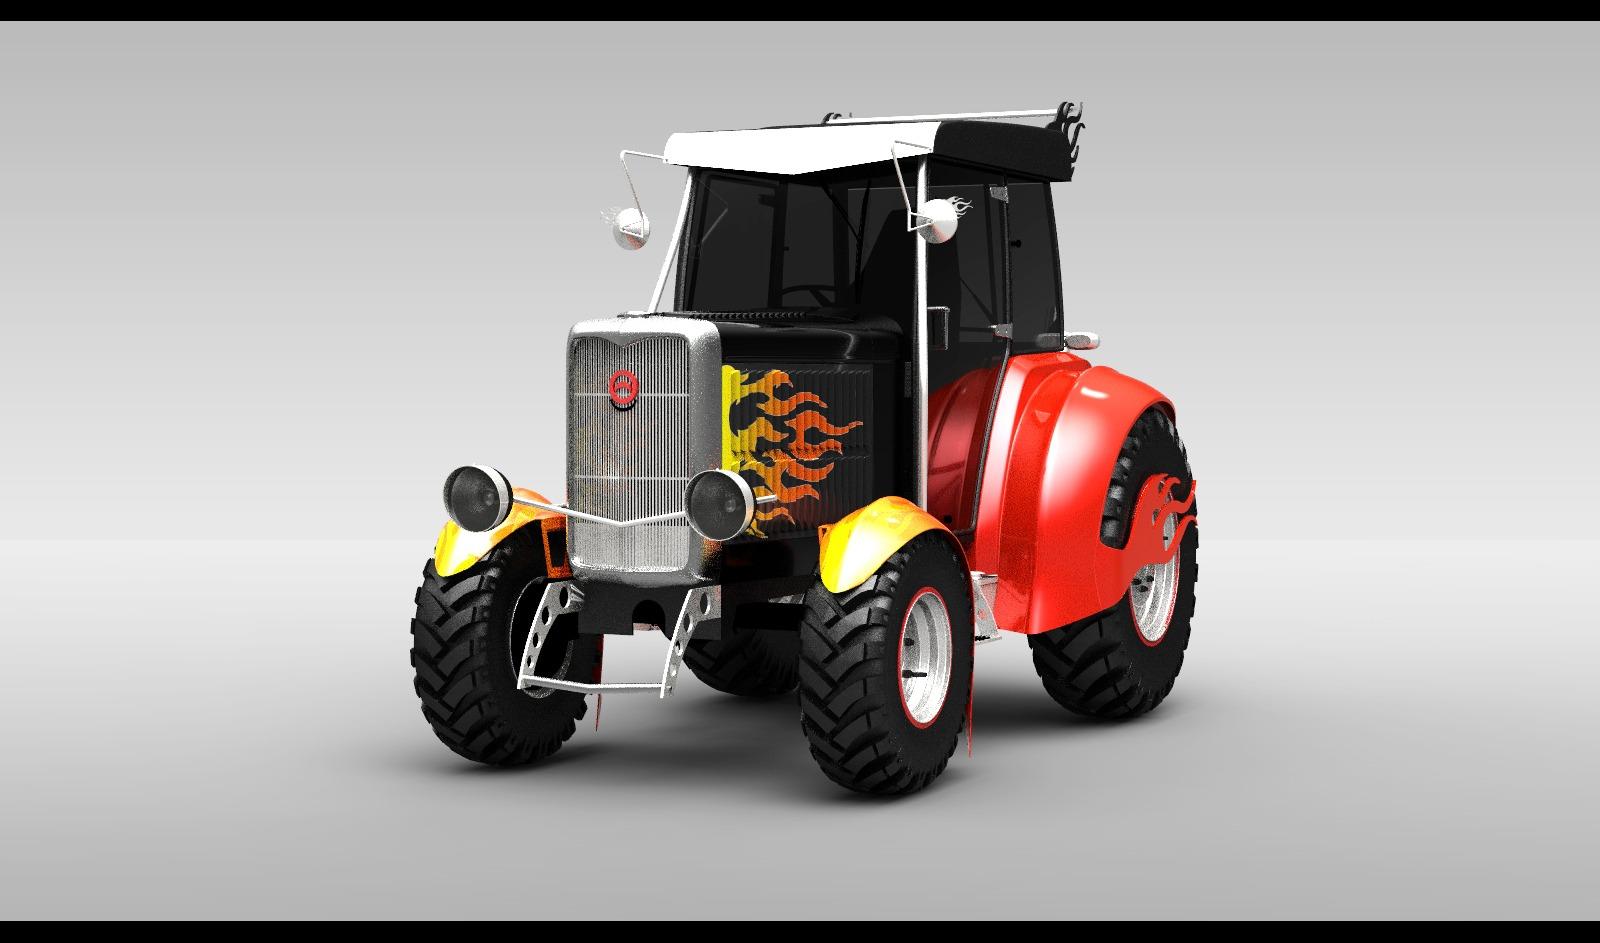 клуб тюнинг тракторов картинки если